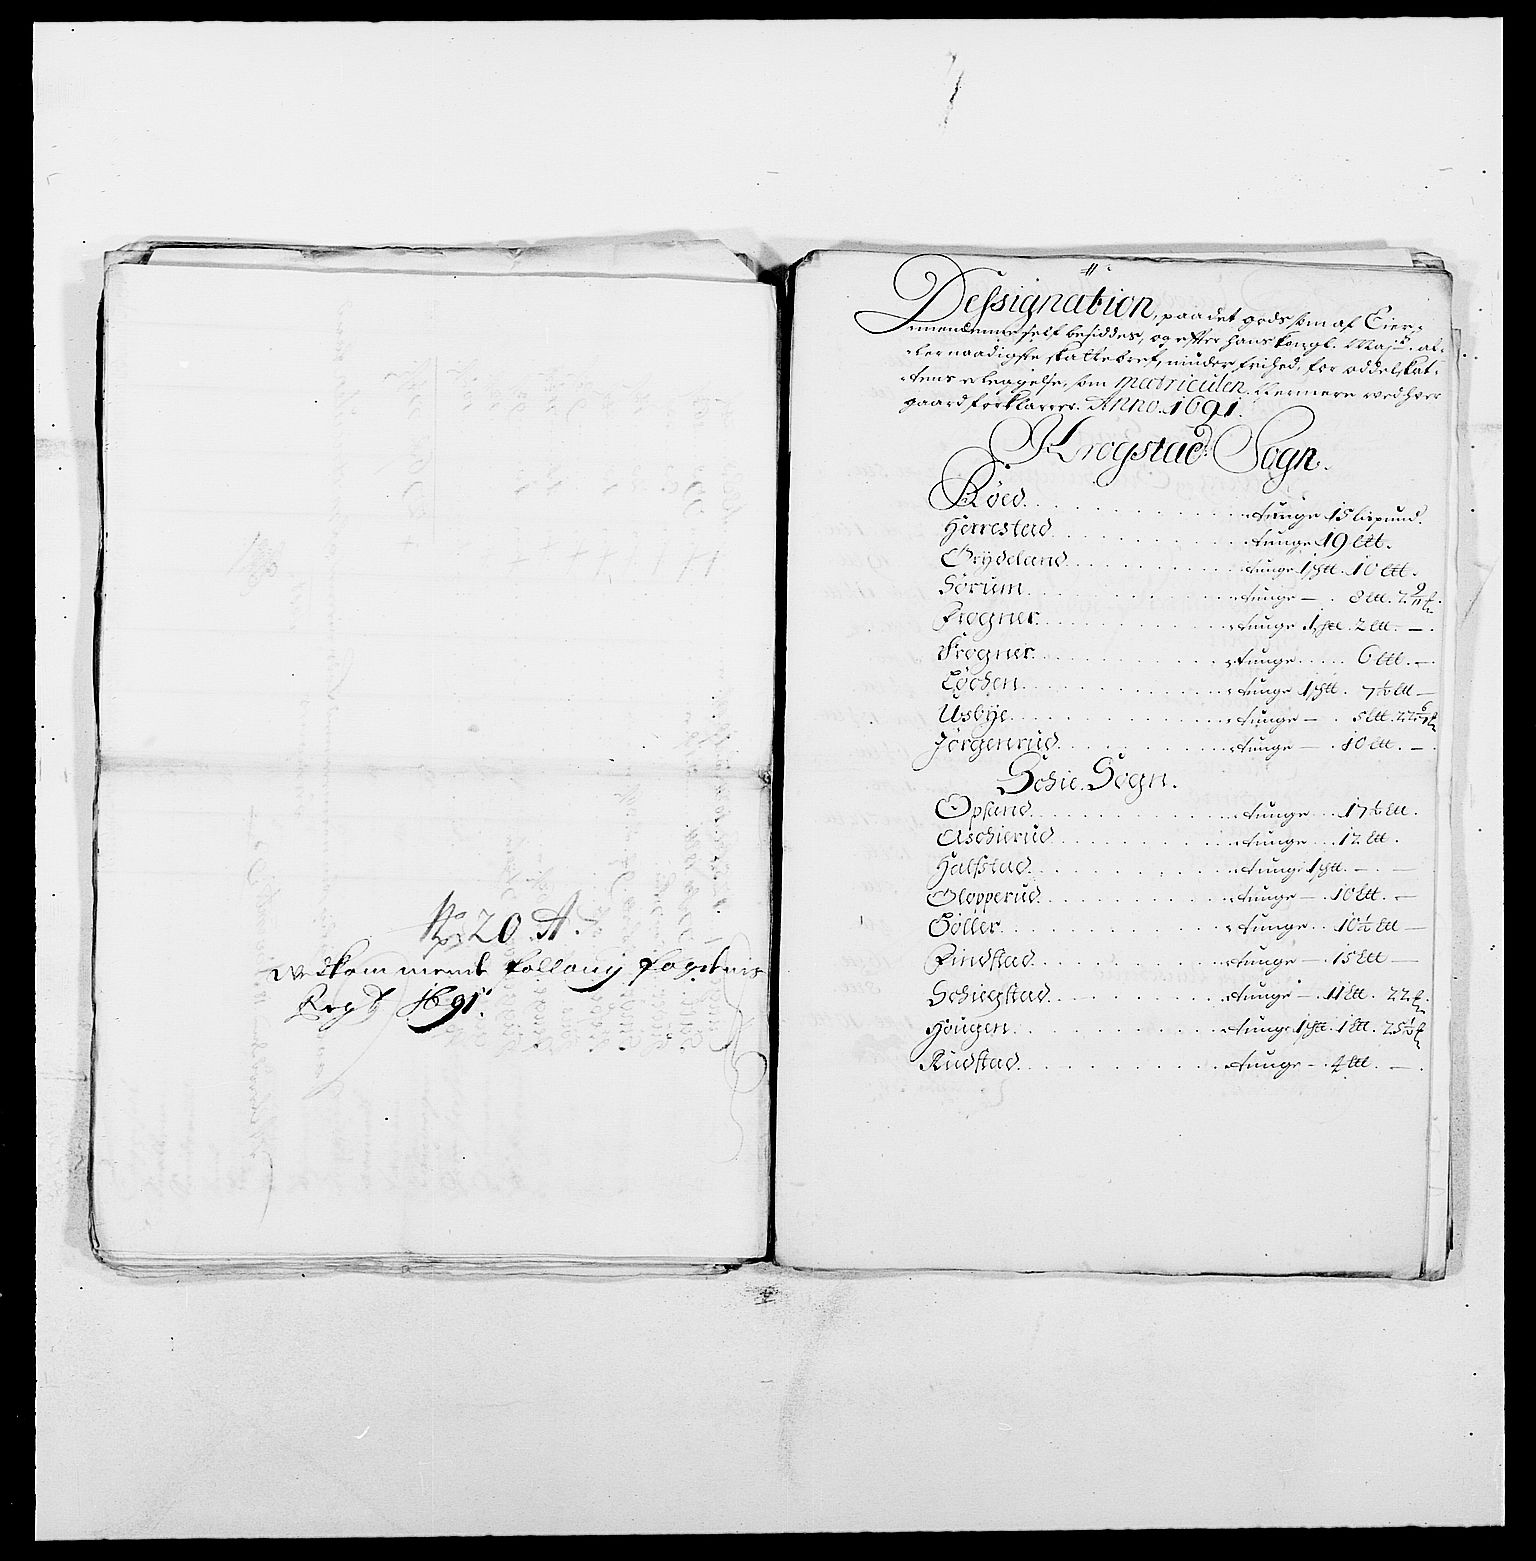 RA, Rentekammeret inntil 1814, Reviderte regnskaper, Fogderegnskap, R09/L0436: Fogderegnskap Follo, 1685-1691, s. 240